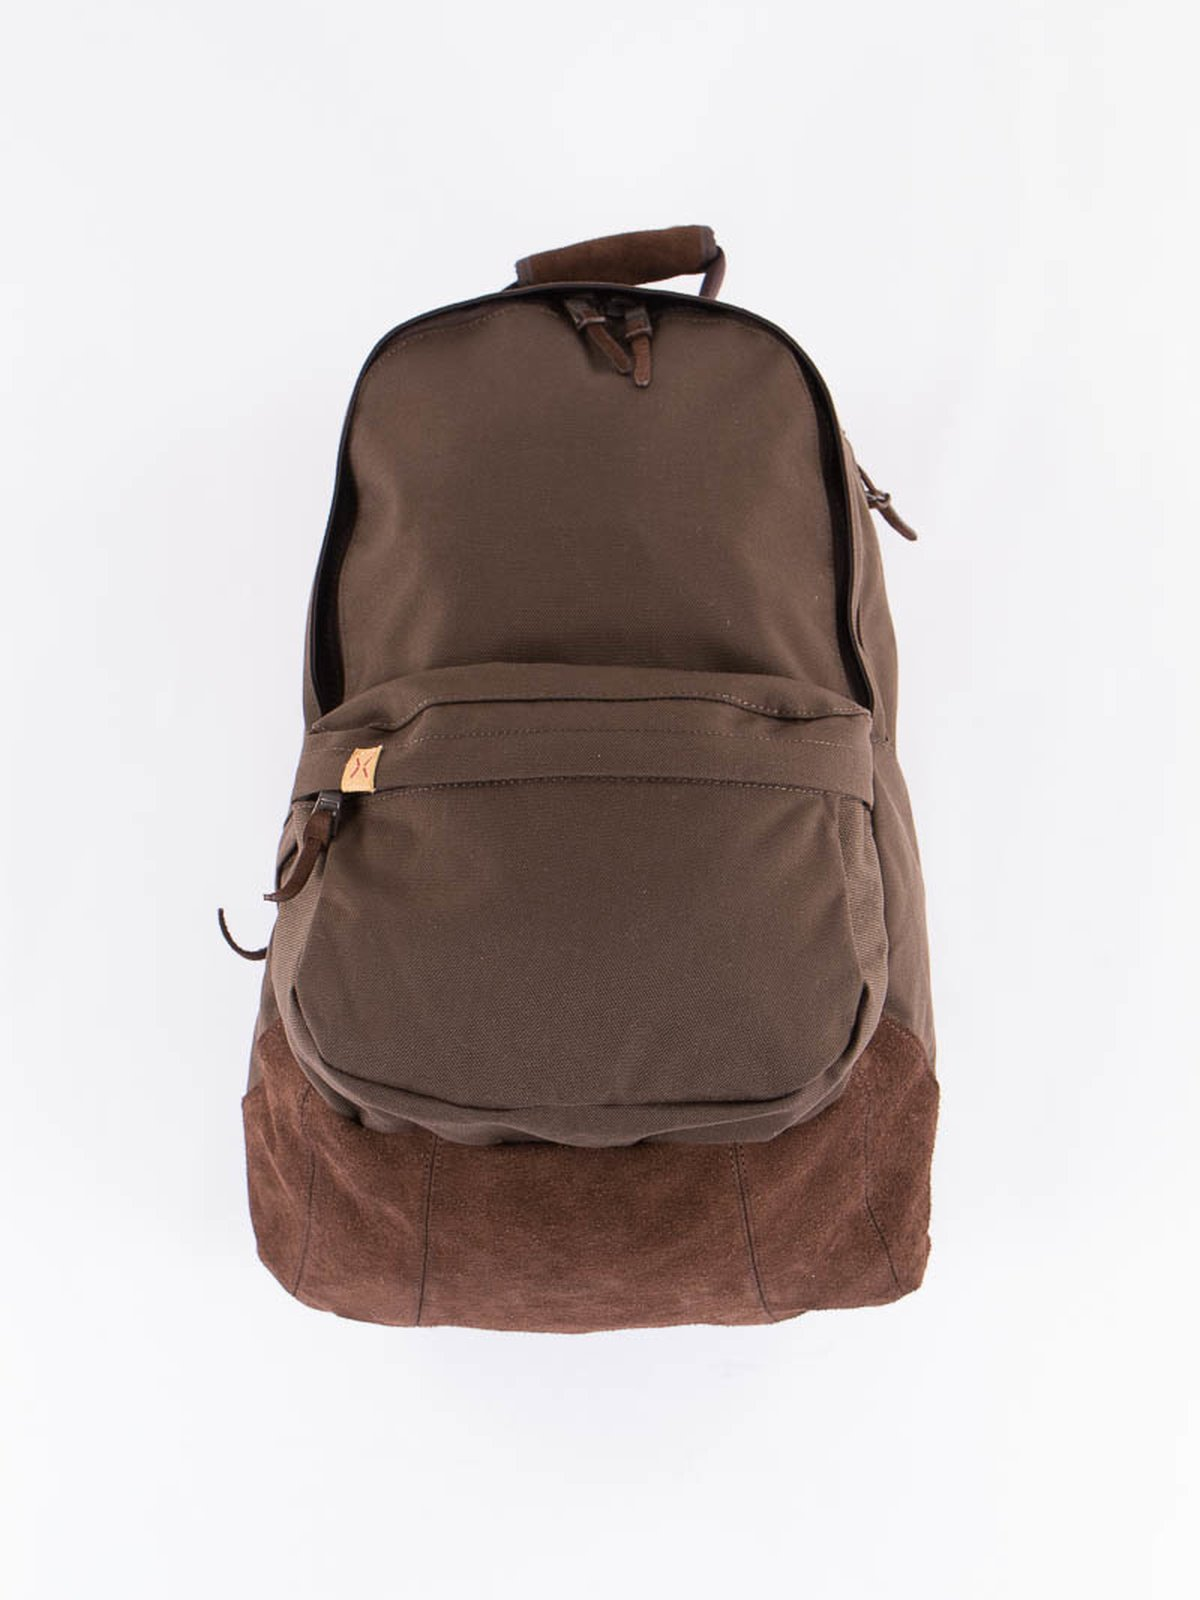 Brown 22L Ballistic Backpack - Image 1